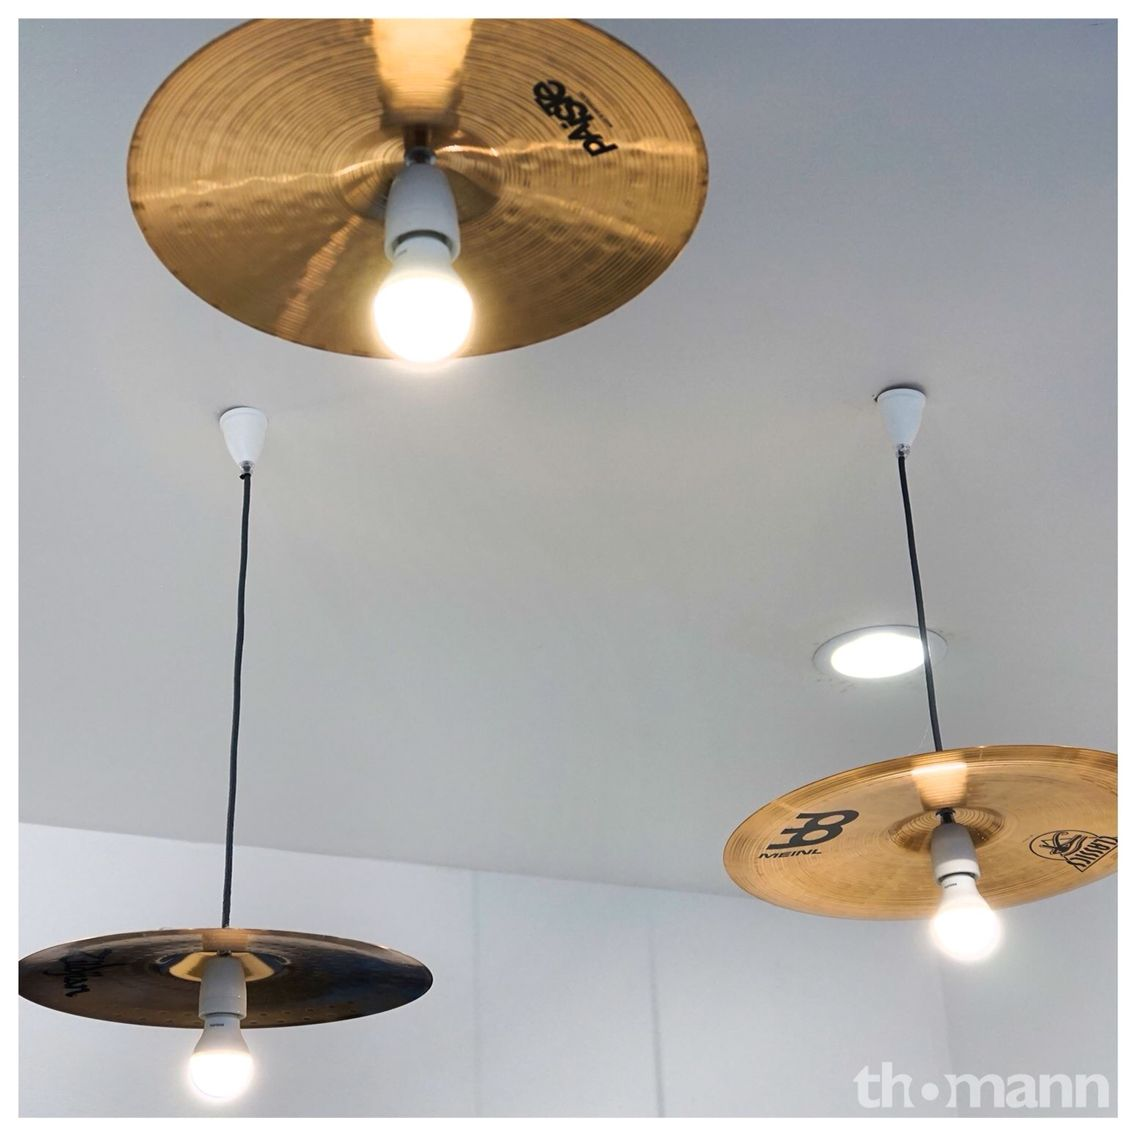 Cymbals. Lights. Music room decor, Drum room, Music